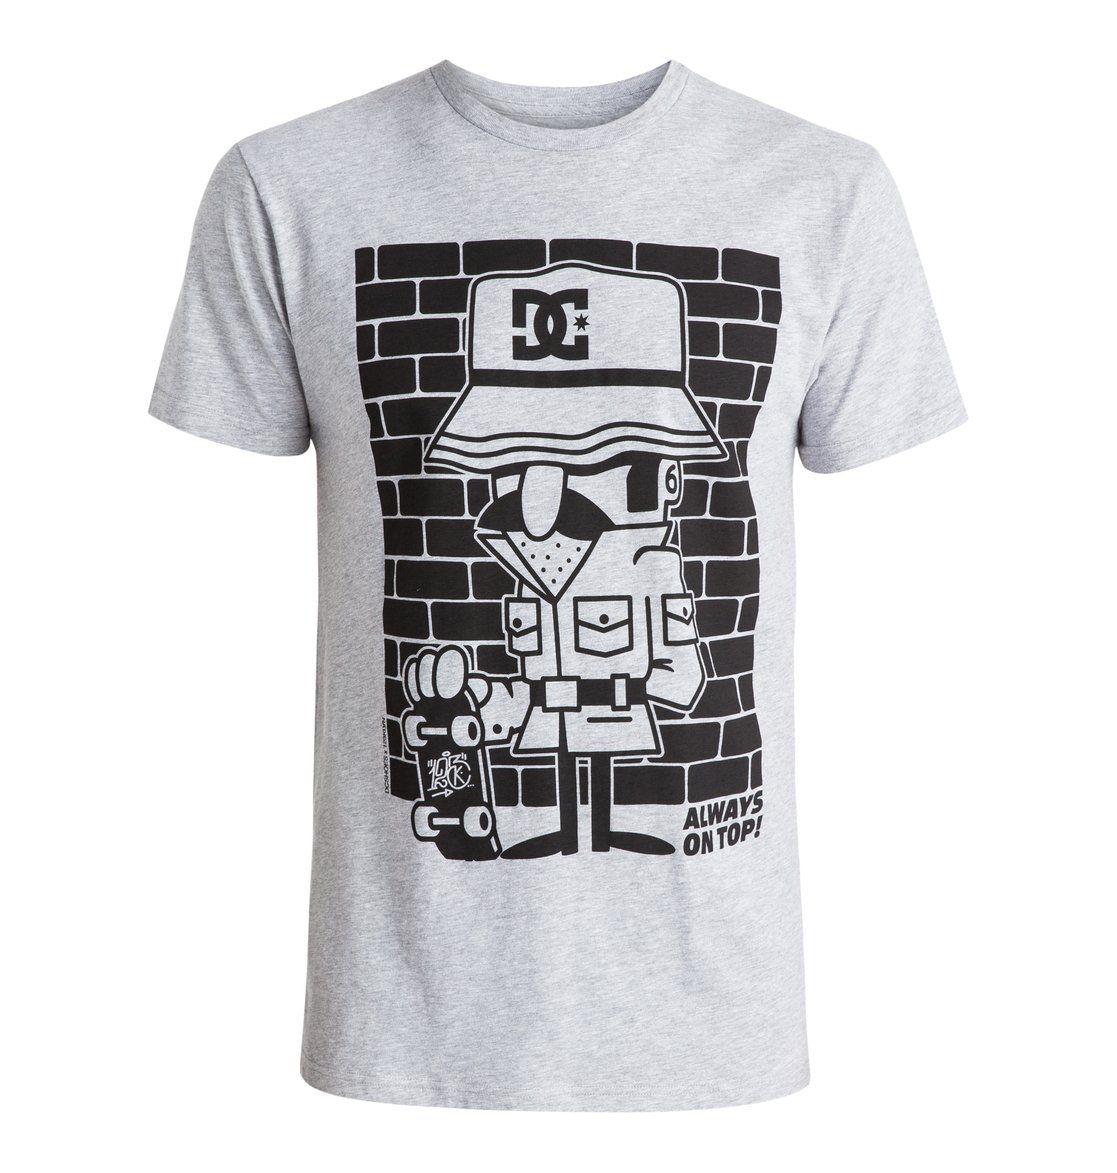 Explore Mens Tee Shirts, T Shirt Men, and more!